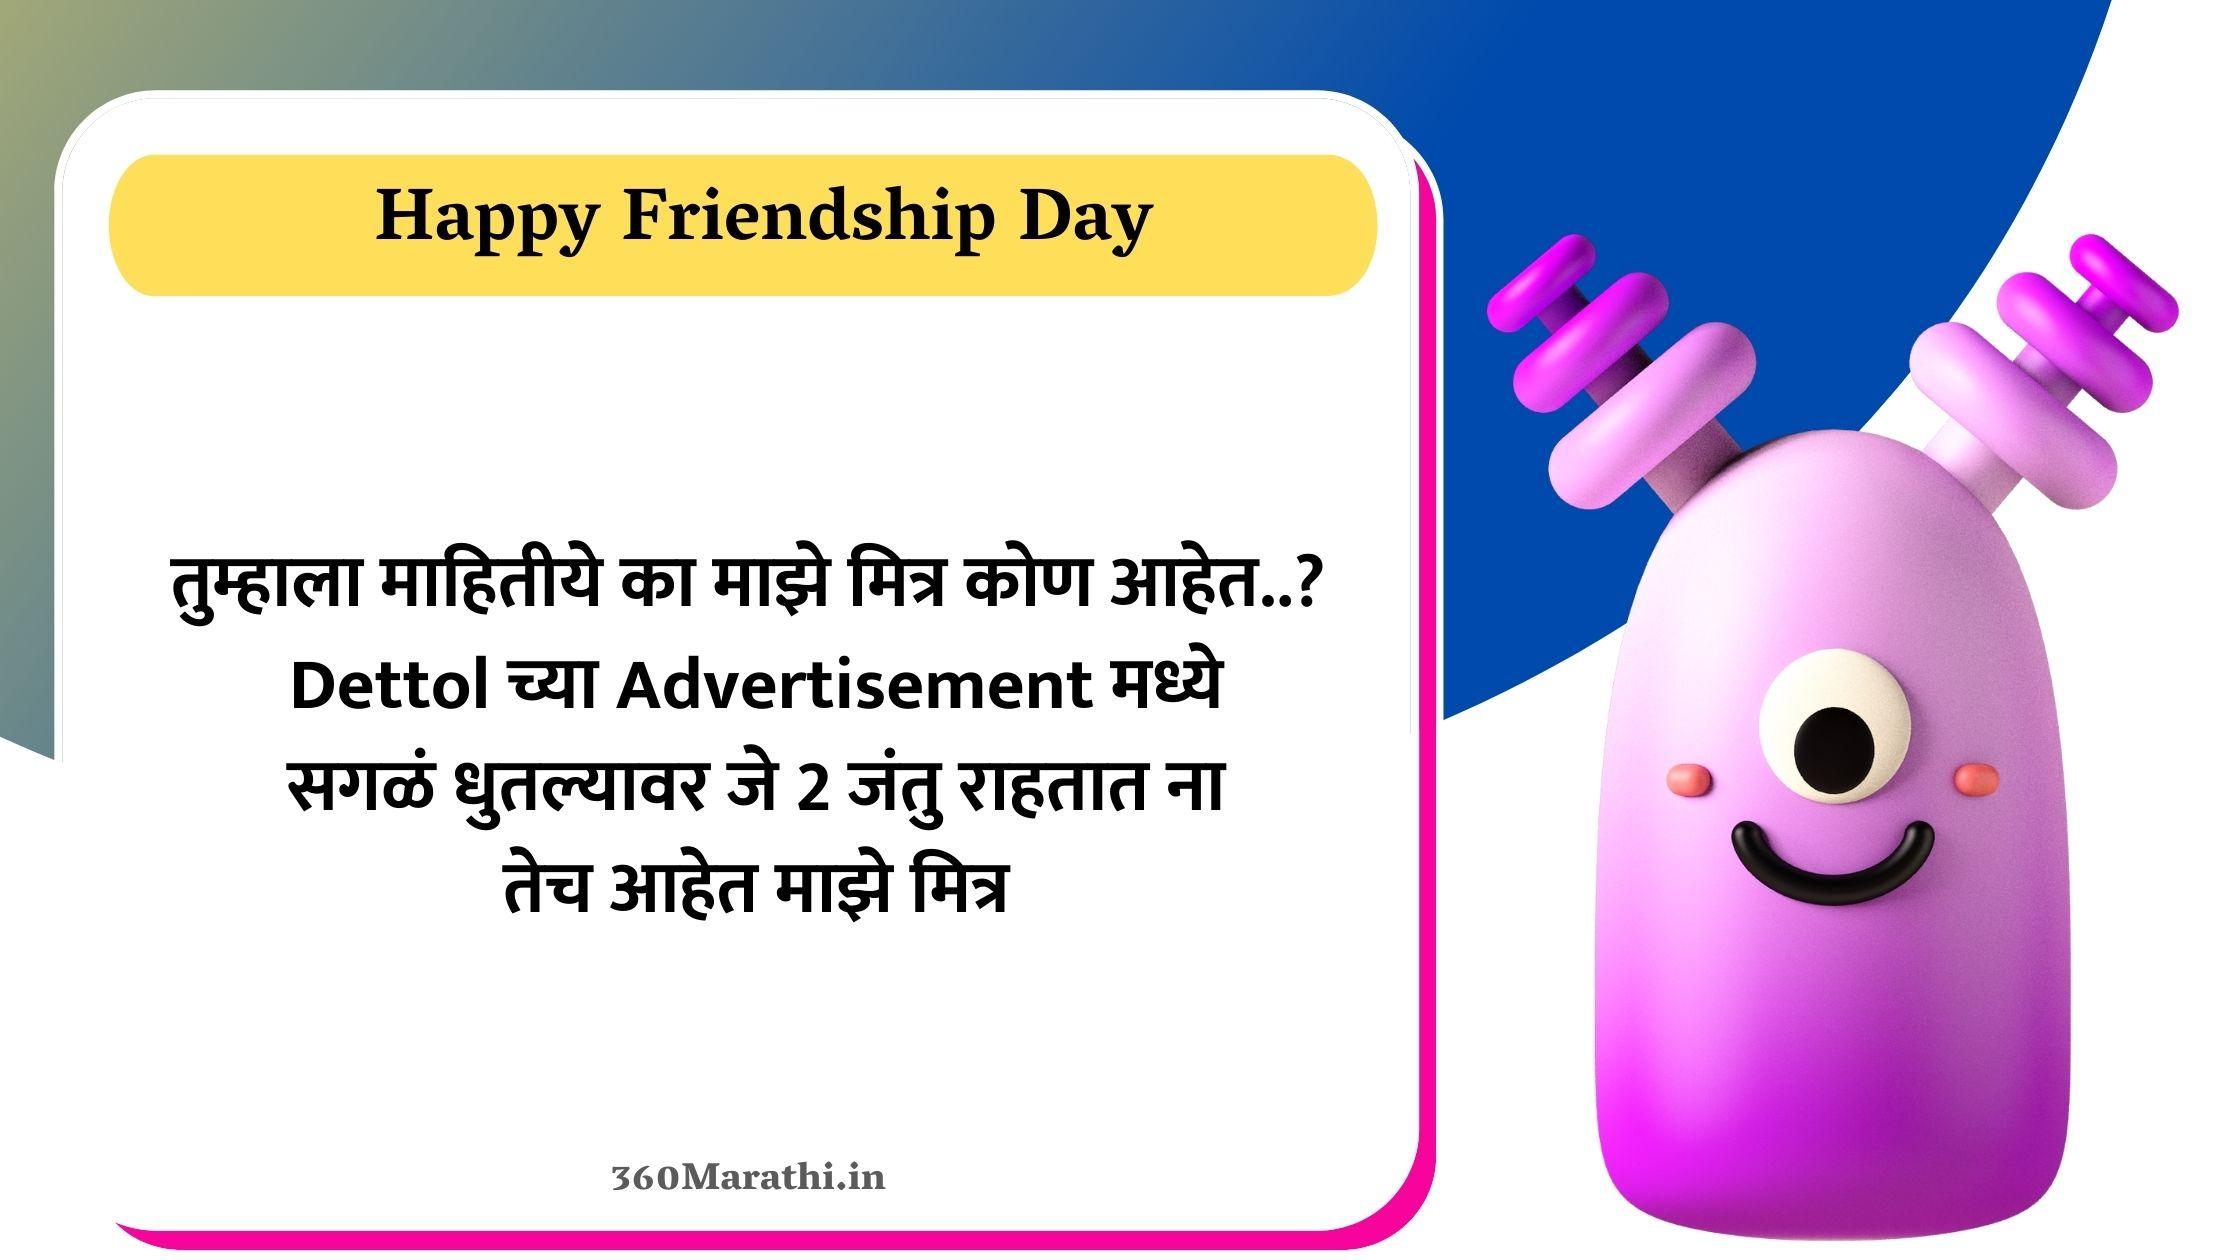 Friendship Day Marathi Images, Banner, Whatsapp Status, Photo Download